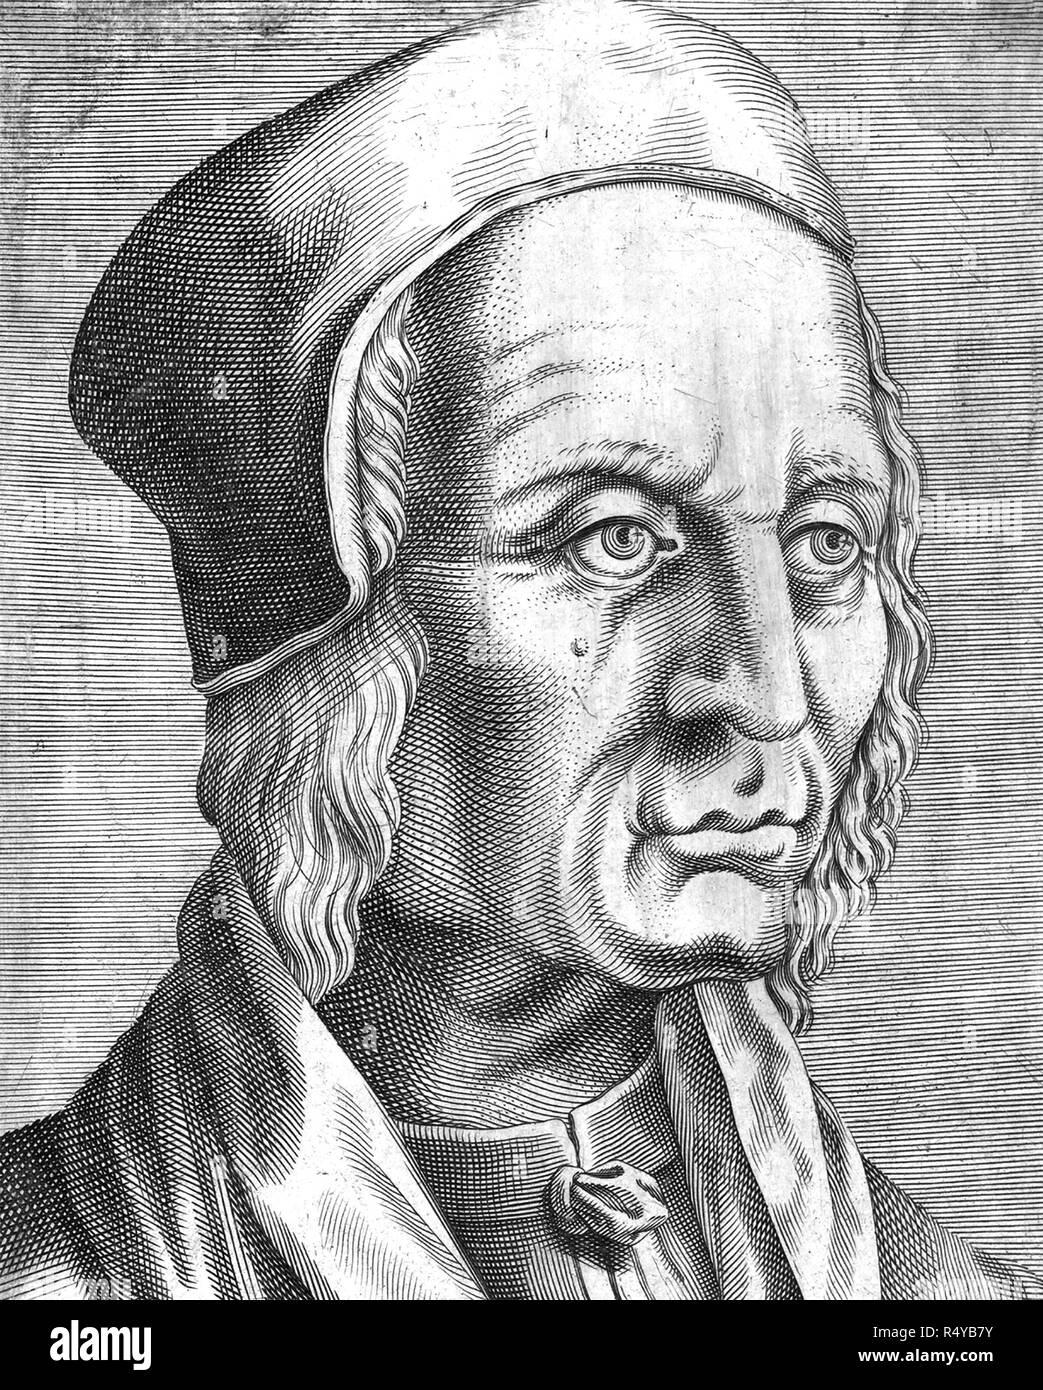 FILIPPO DECIO (1454-c 1535) Italian jurist - Stock Image